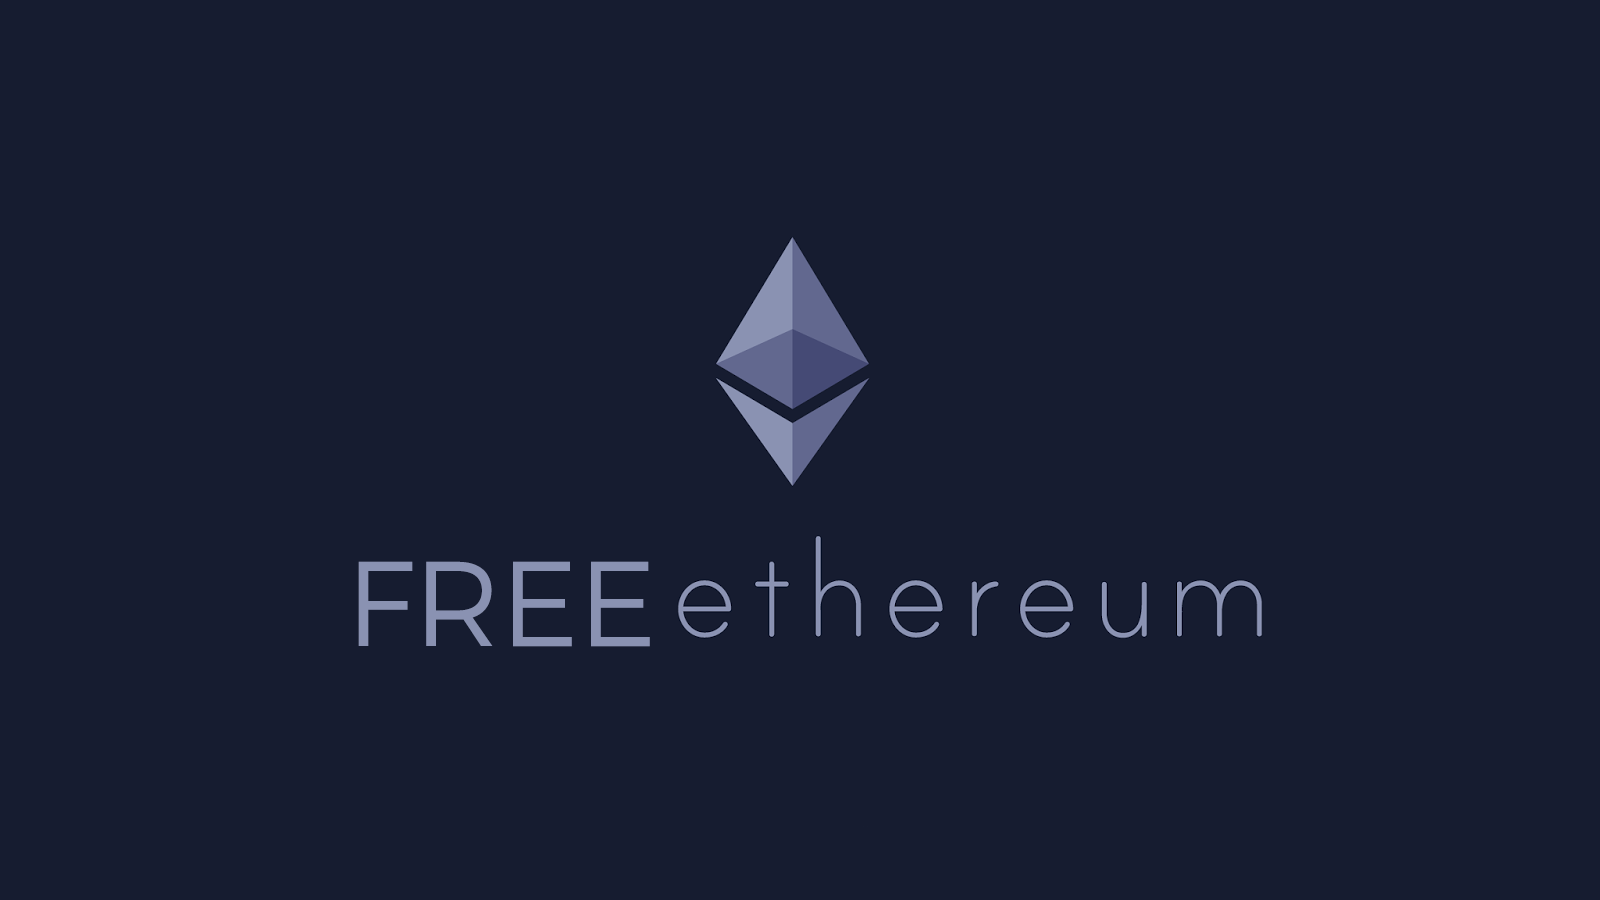 Ethereum Faucet - Free ETH 🤑 - GPU Mining Bios Mod Database